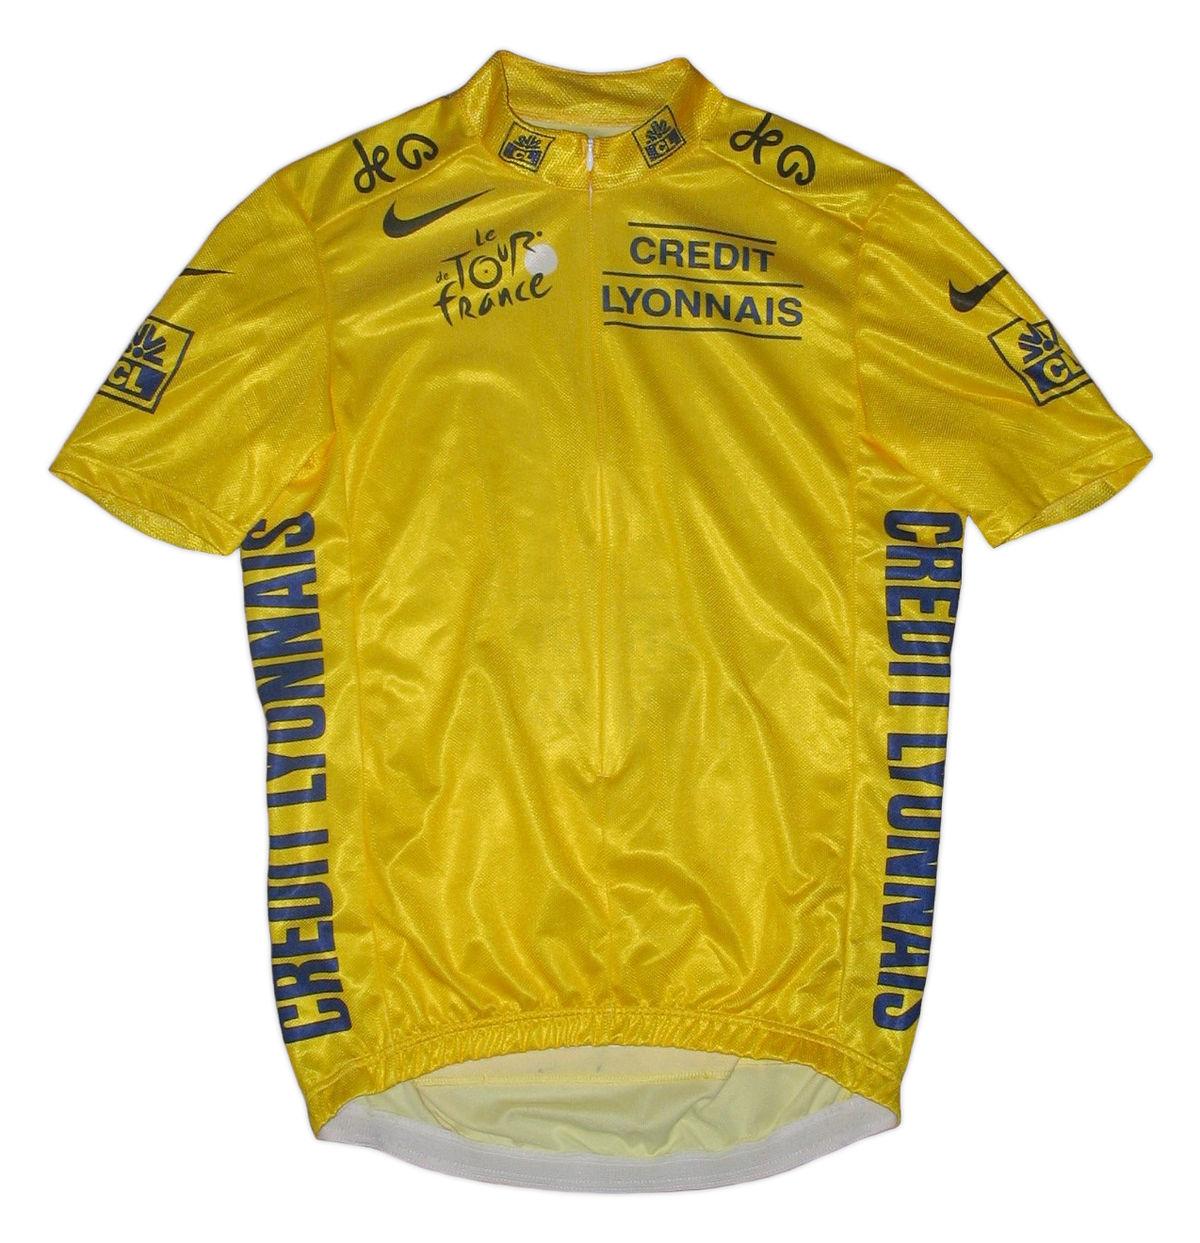 Cycling jersey - Wikipedia 389e9243e